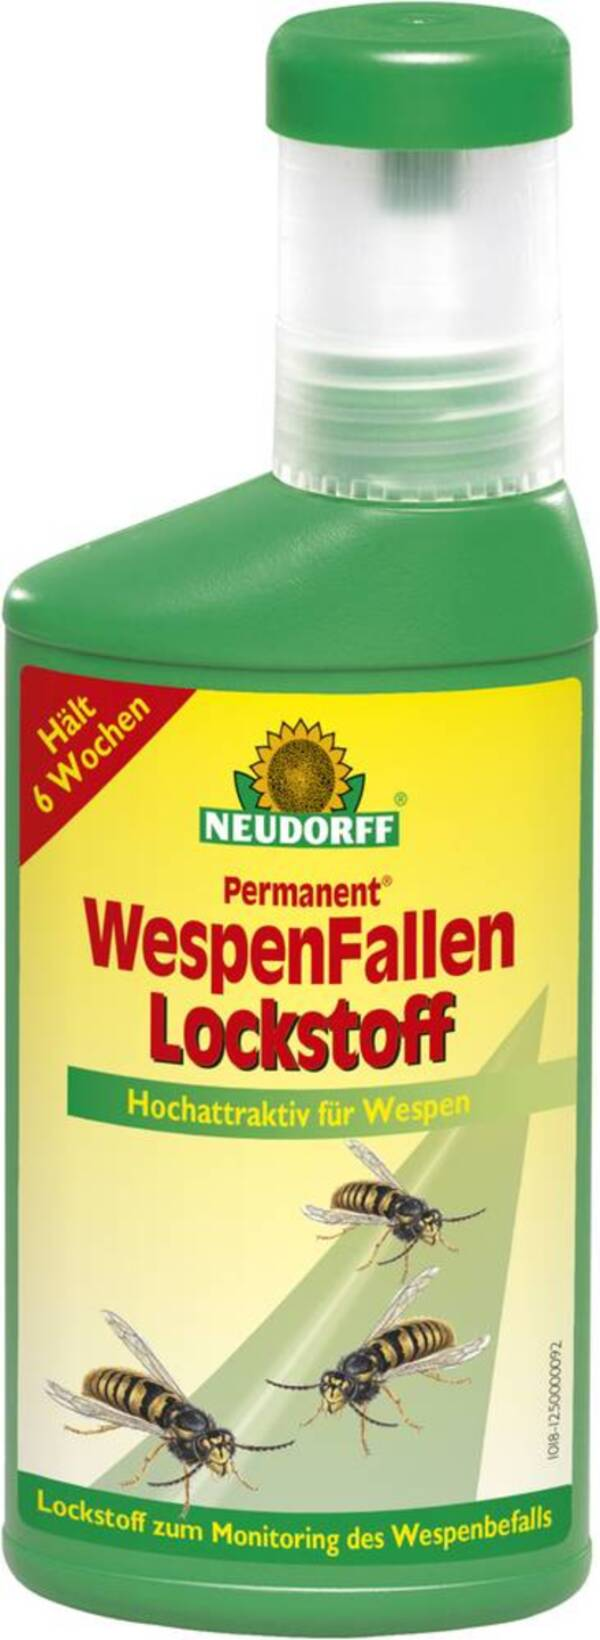 Permanent Wespen Fallen Lockstoff - 250 ml Neudorff